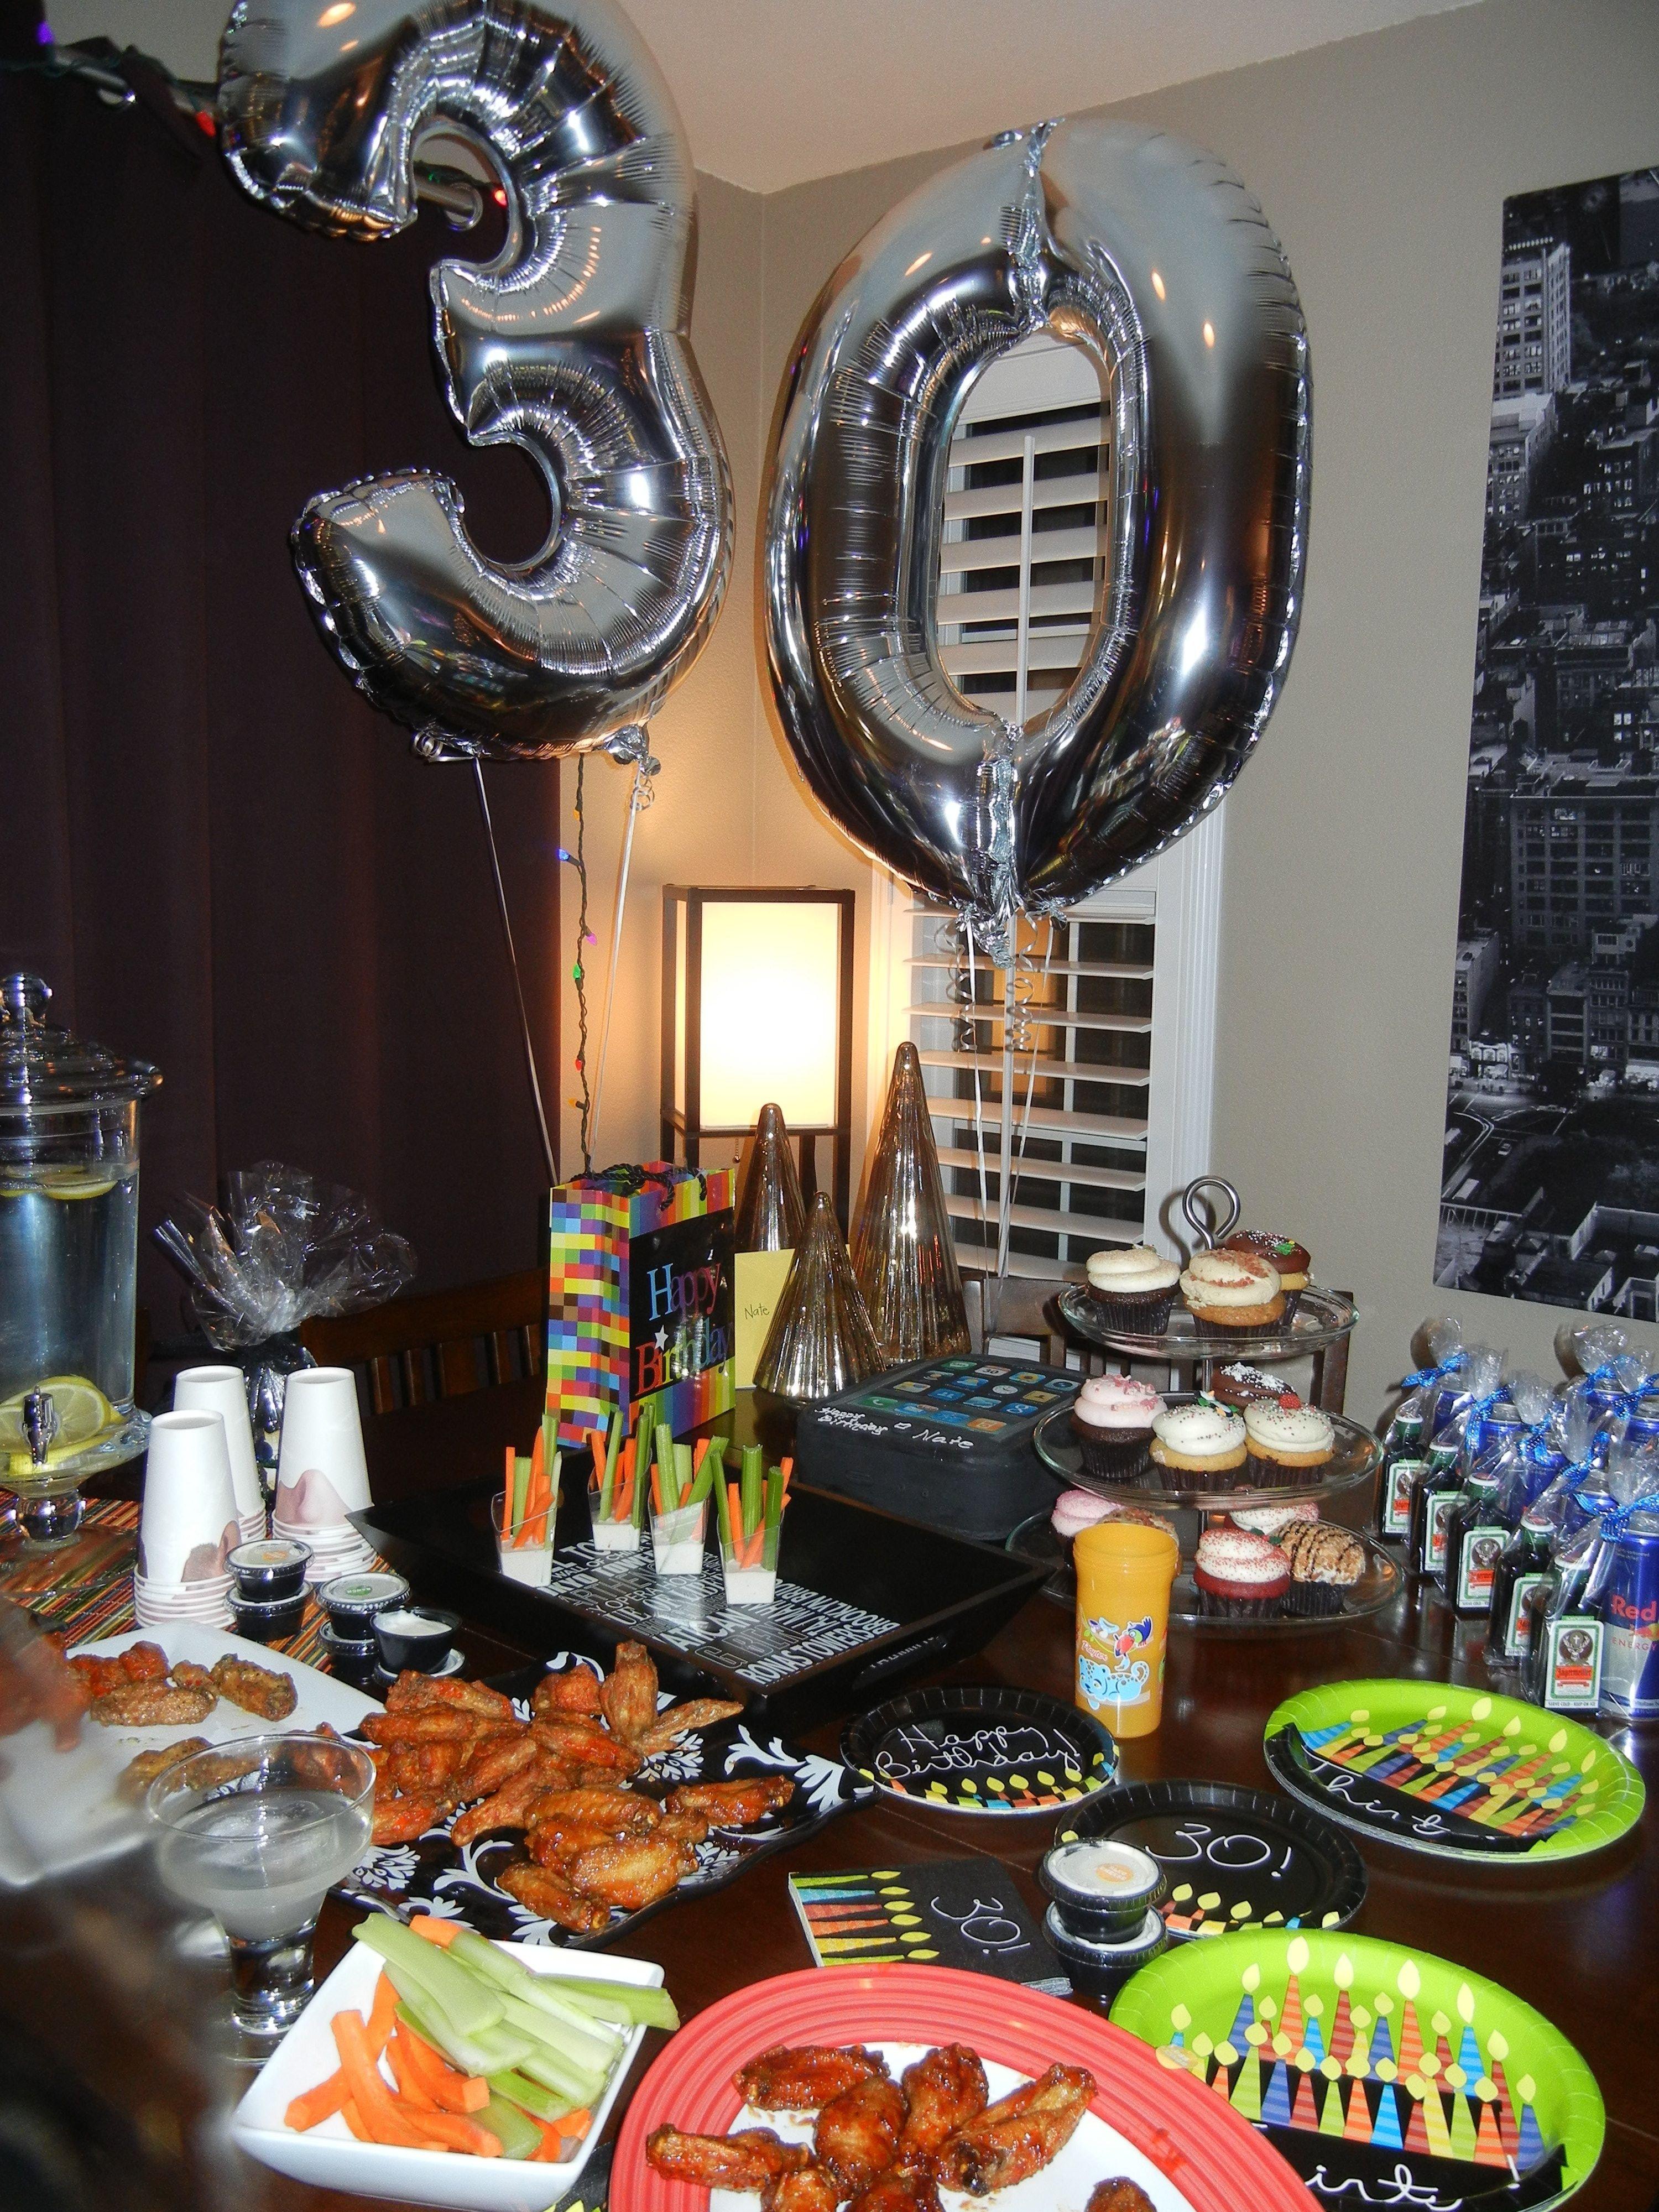 10 Stylish Birthday Party Ideas For Husband husbands 30th birthday my stuff pinterest 30 birthday 30th 10 2020